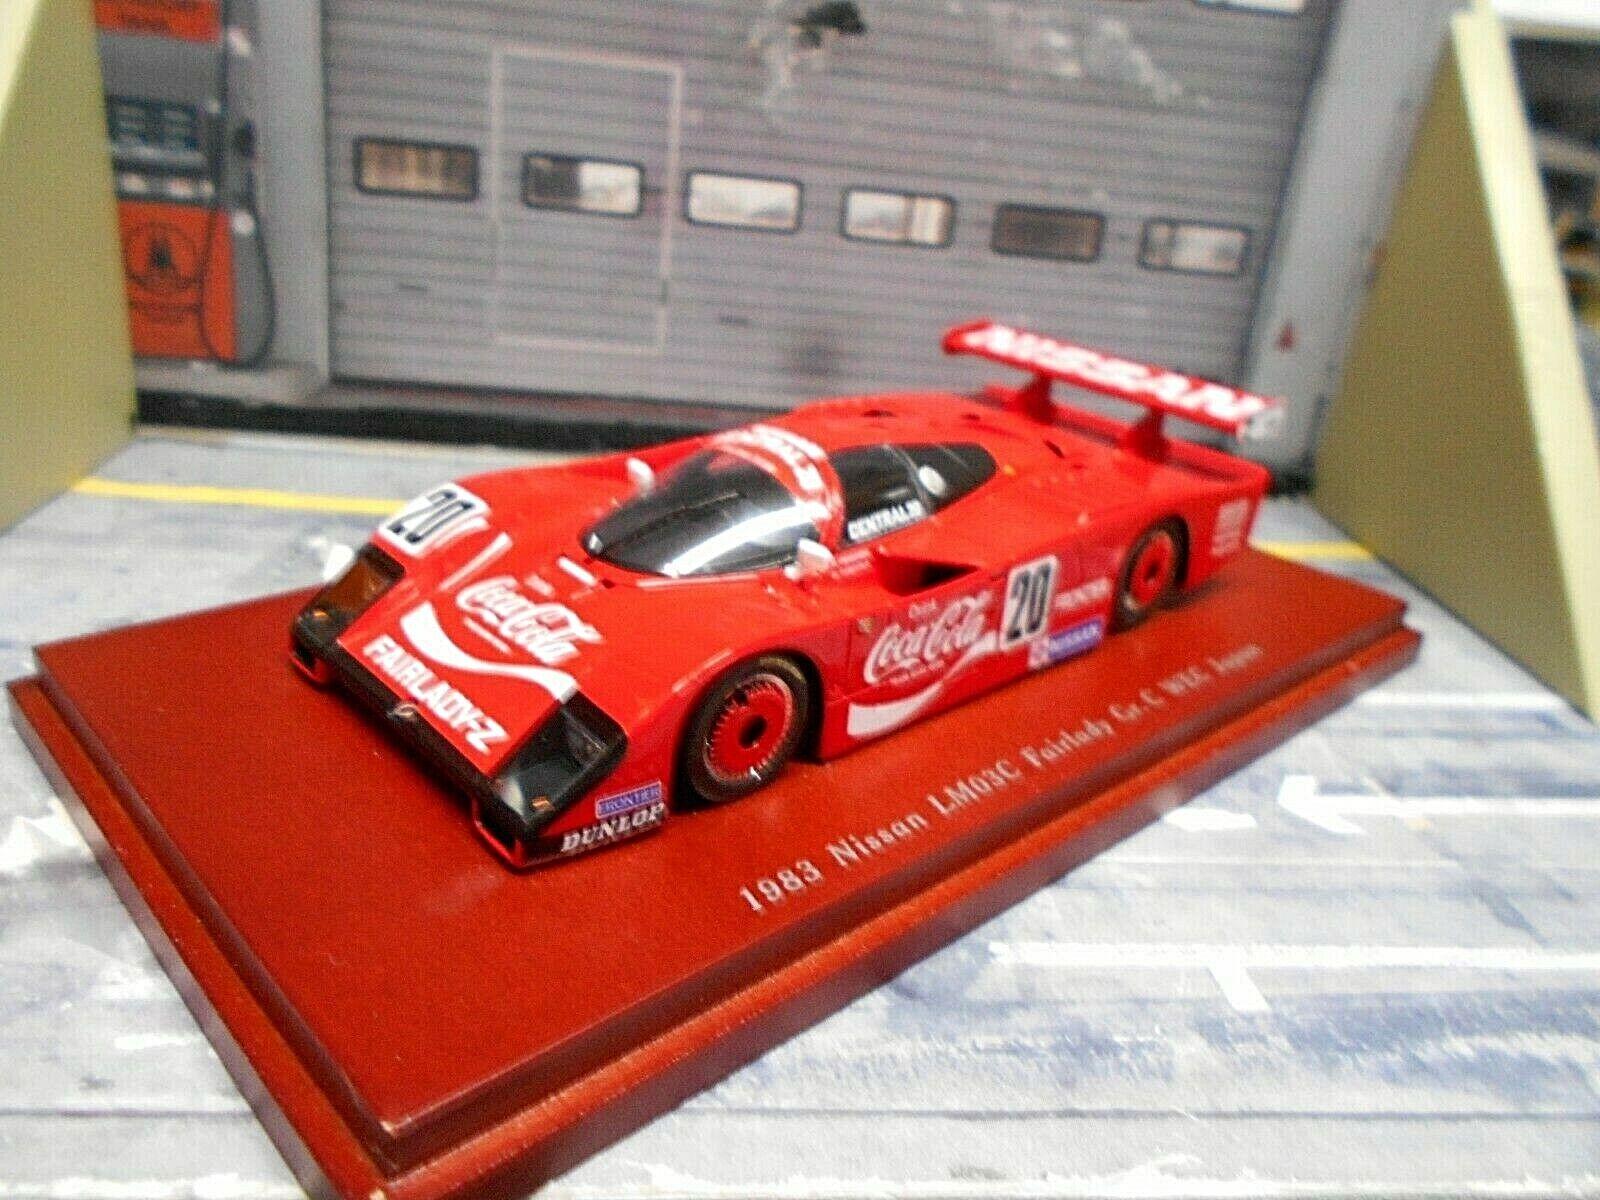 NISSAN LM03C Gr.C Fairlady Z Gr.C 1983 WEC Japan  20 Coca Cola TSM 1 43